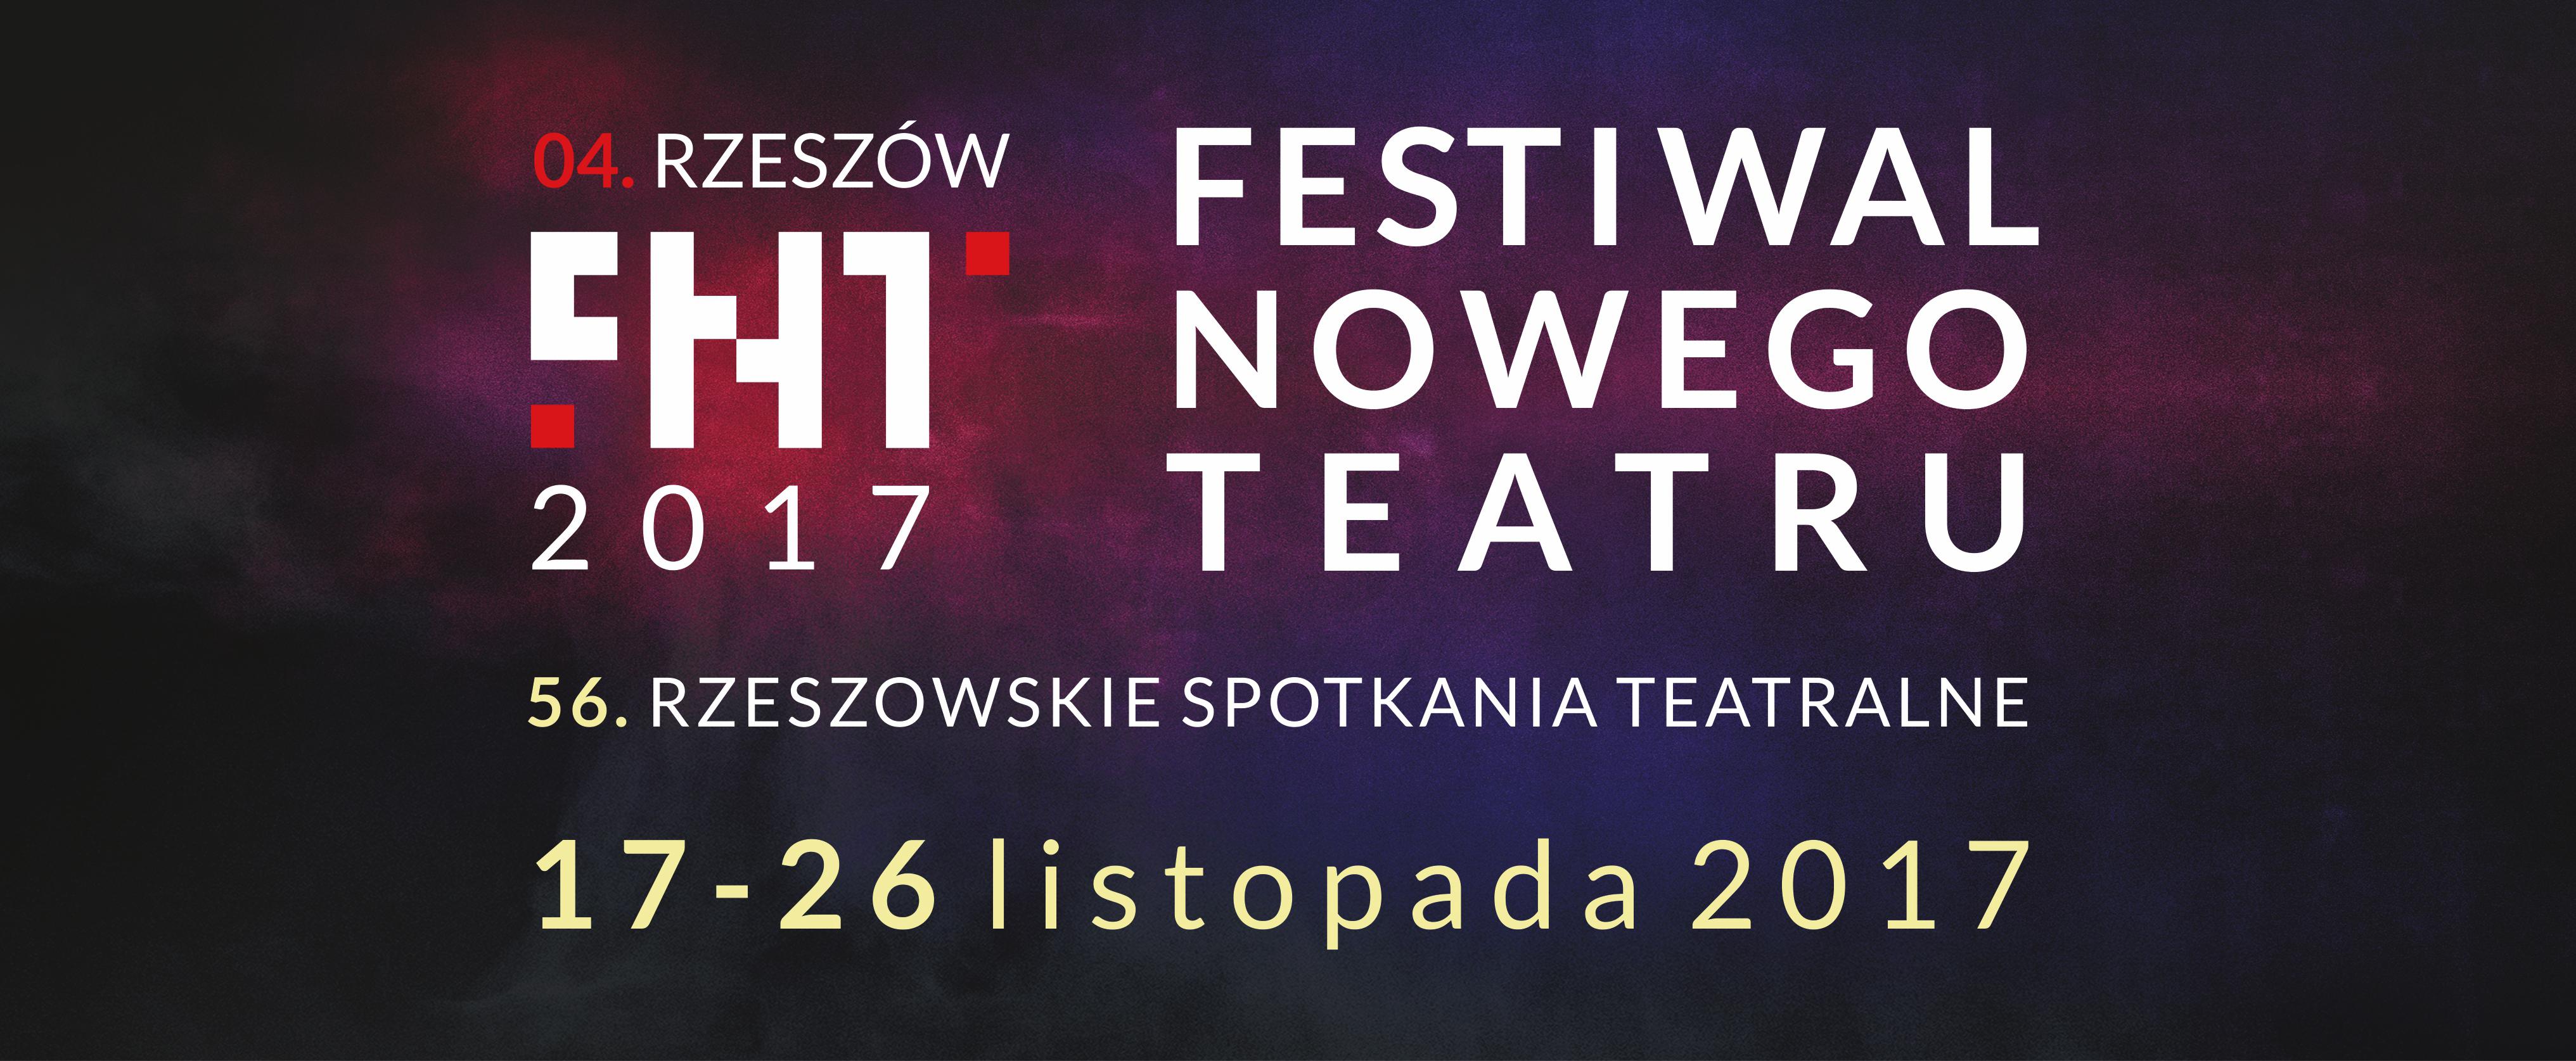 Wielki sukces Festiwalu Nowego Teatru 2017